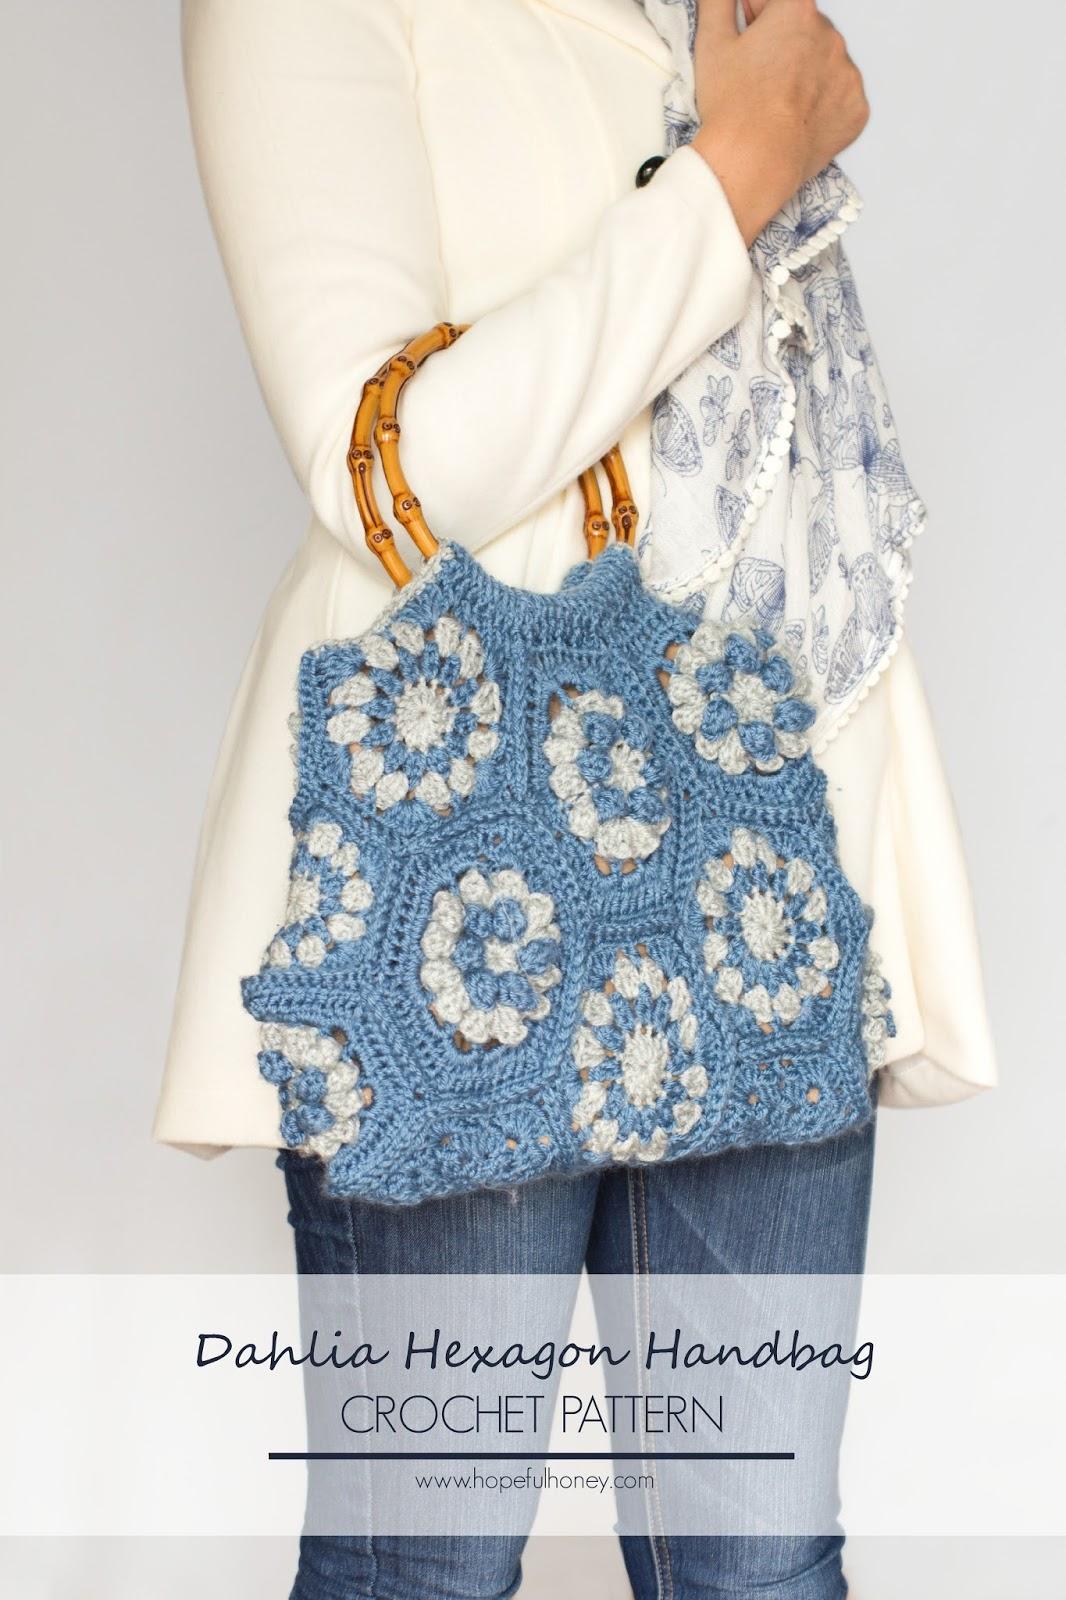 Hexagon Crochet Bag Pattern : ... Honey Craft, Crochet, Create: Dahlia Hexagon Handbag Crochet Pattern